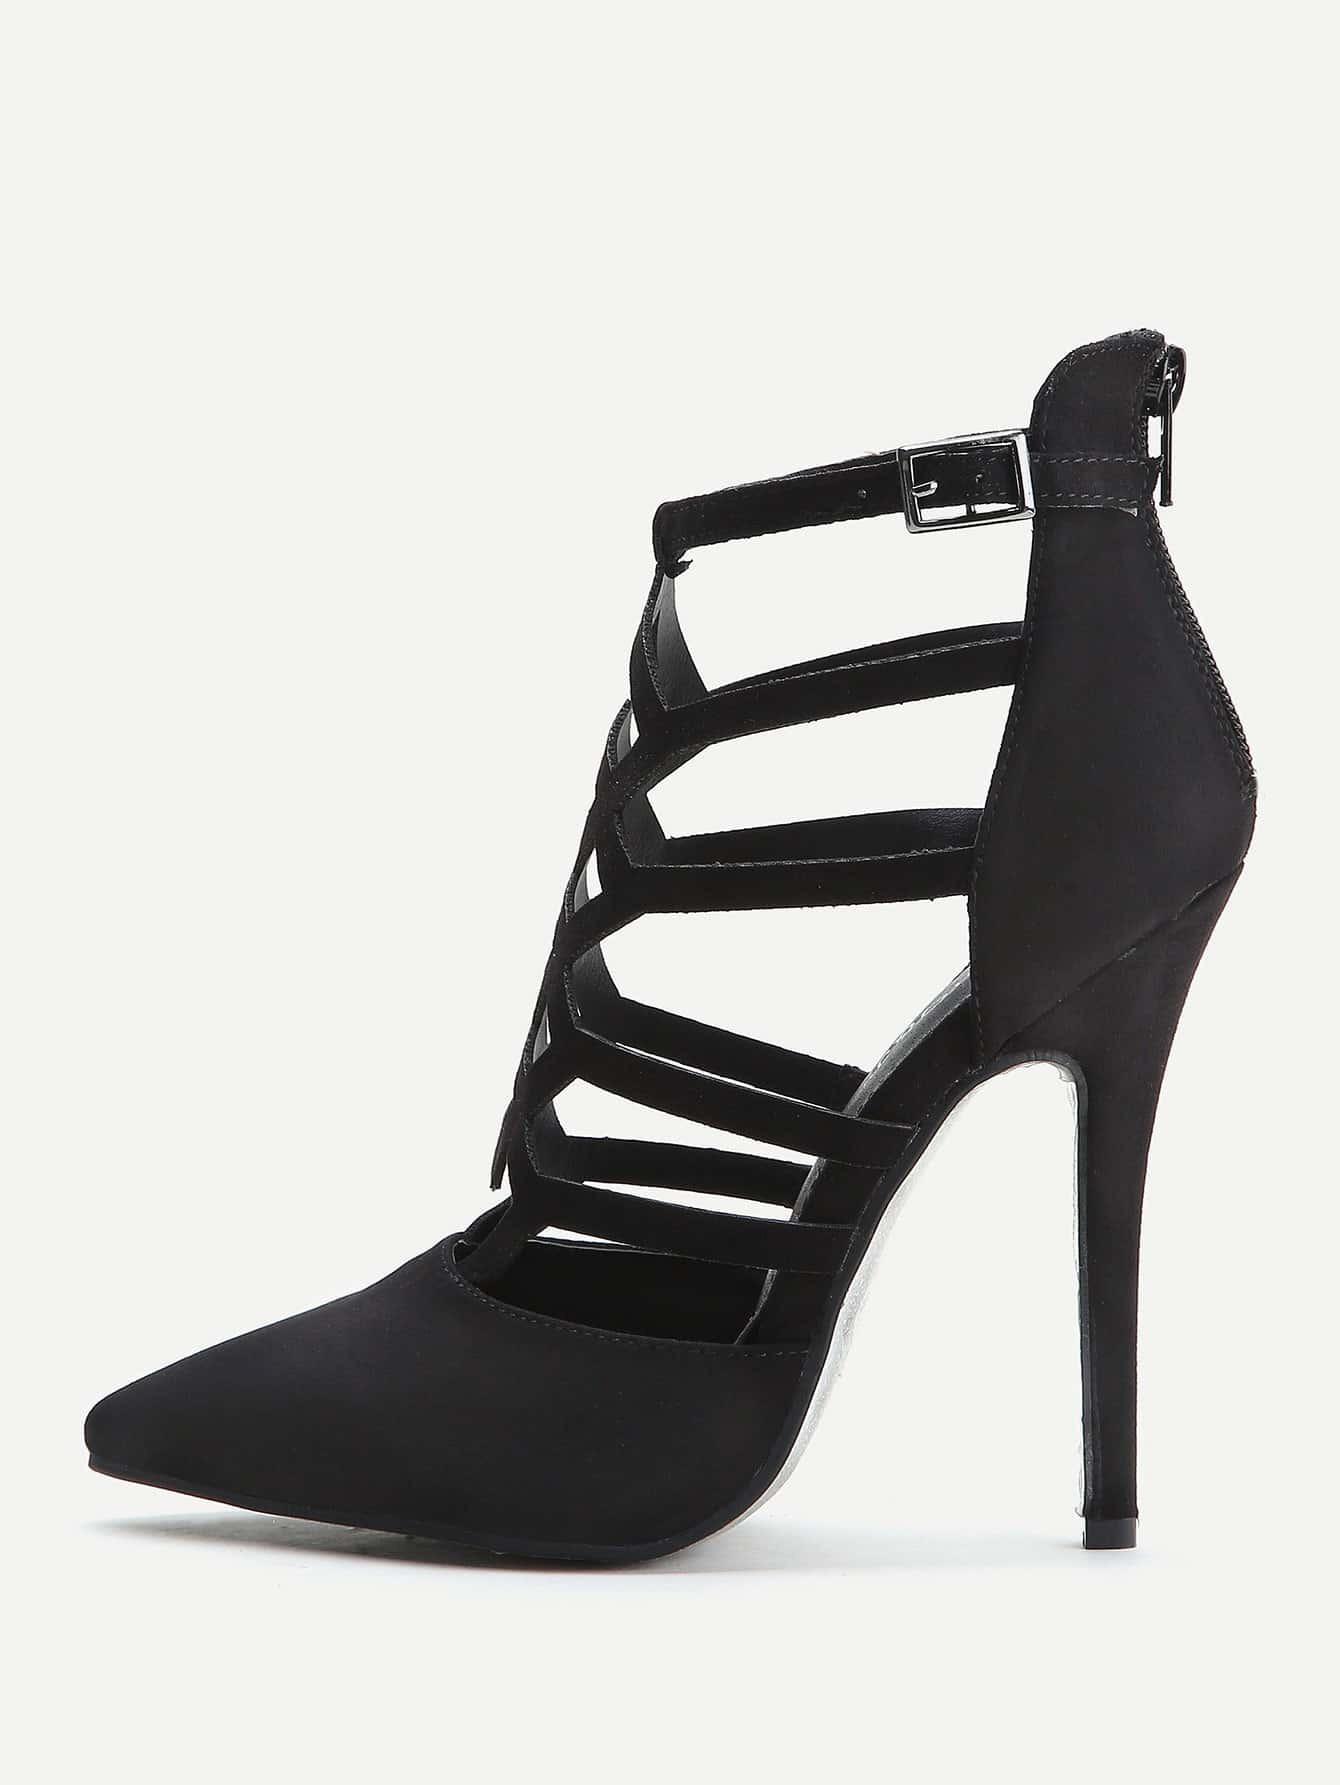 06421c962a4 Black Cutout Zipper Back Stiletto Heels EmmaCloth-Women Fast Fashion ...